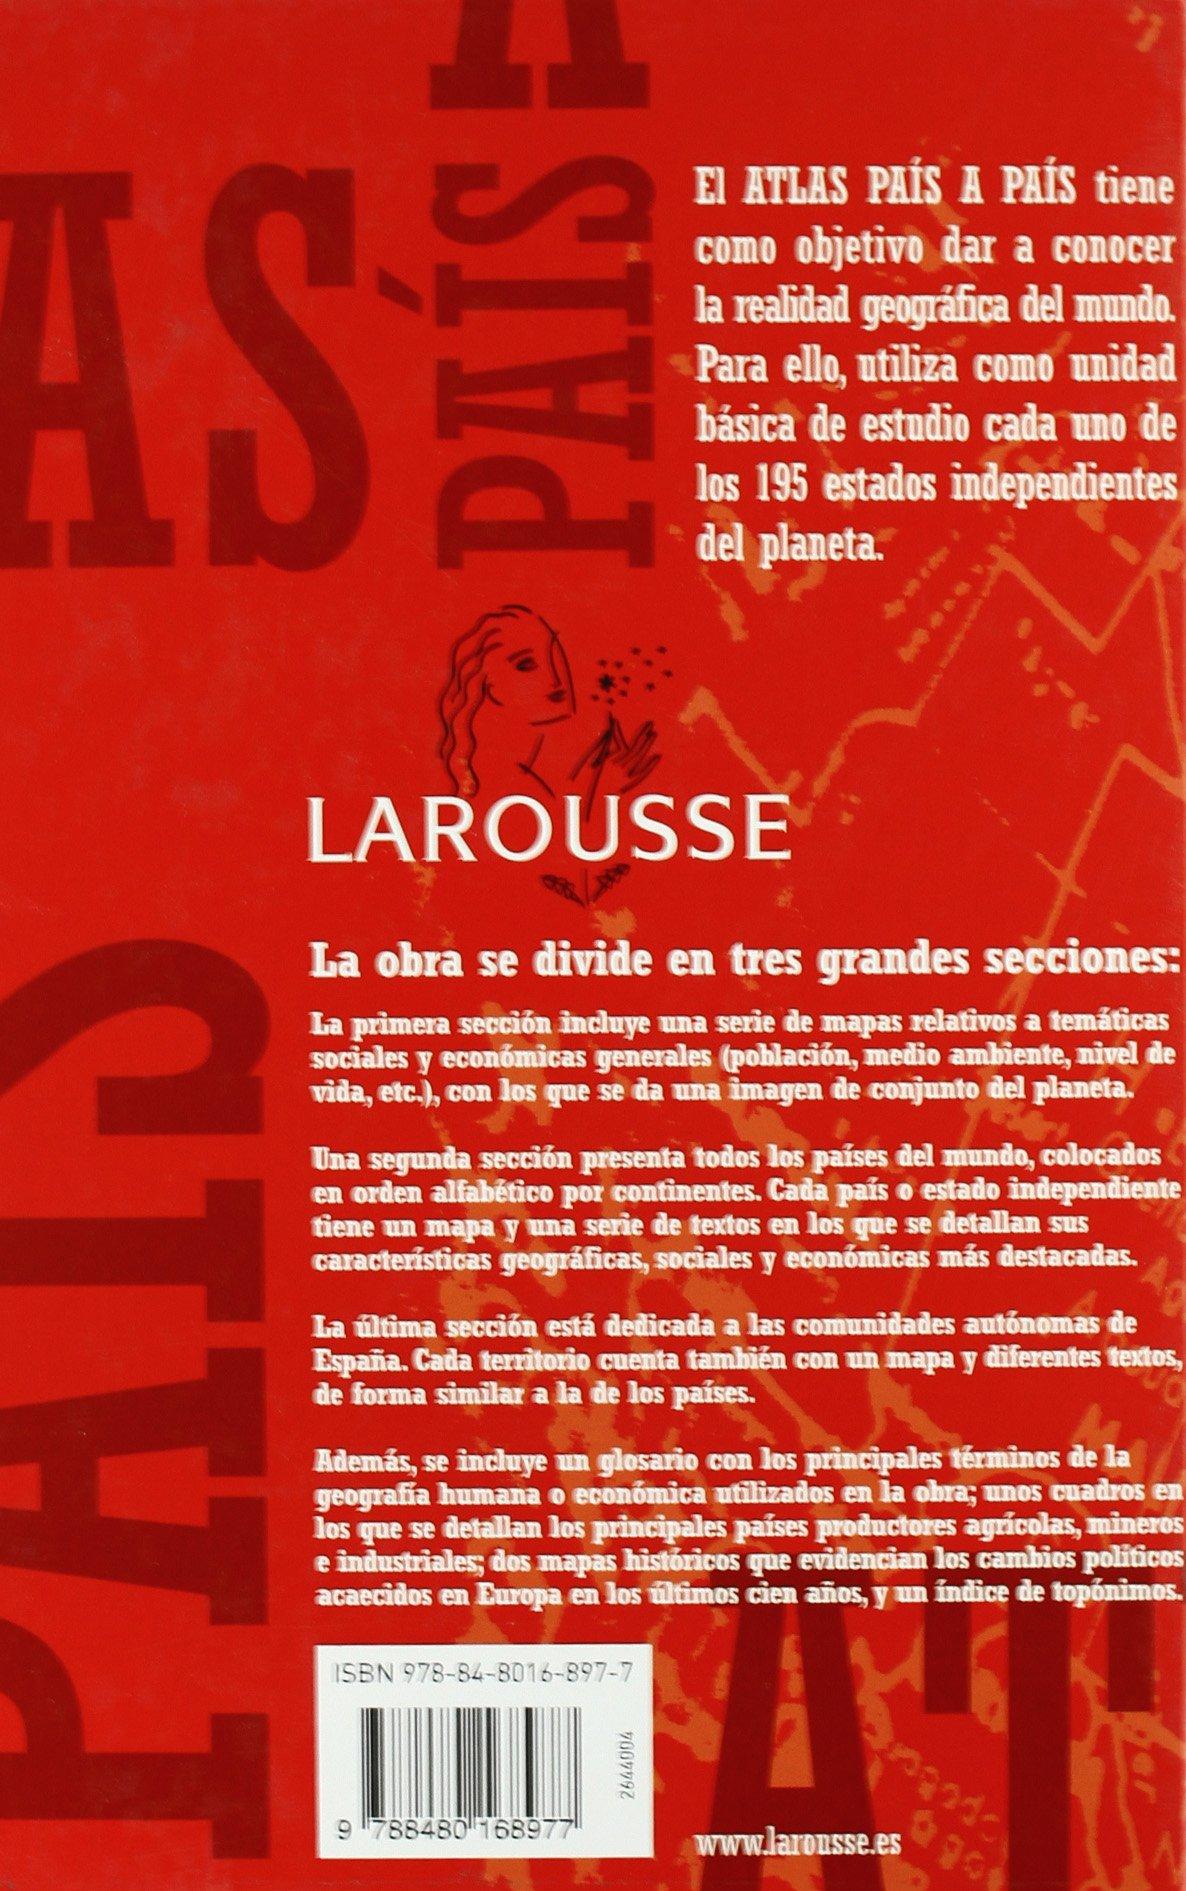 Atlas País a País (Larousse - Atlas): Amazon.es: Aa.Vv.: Libros